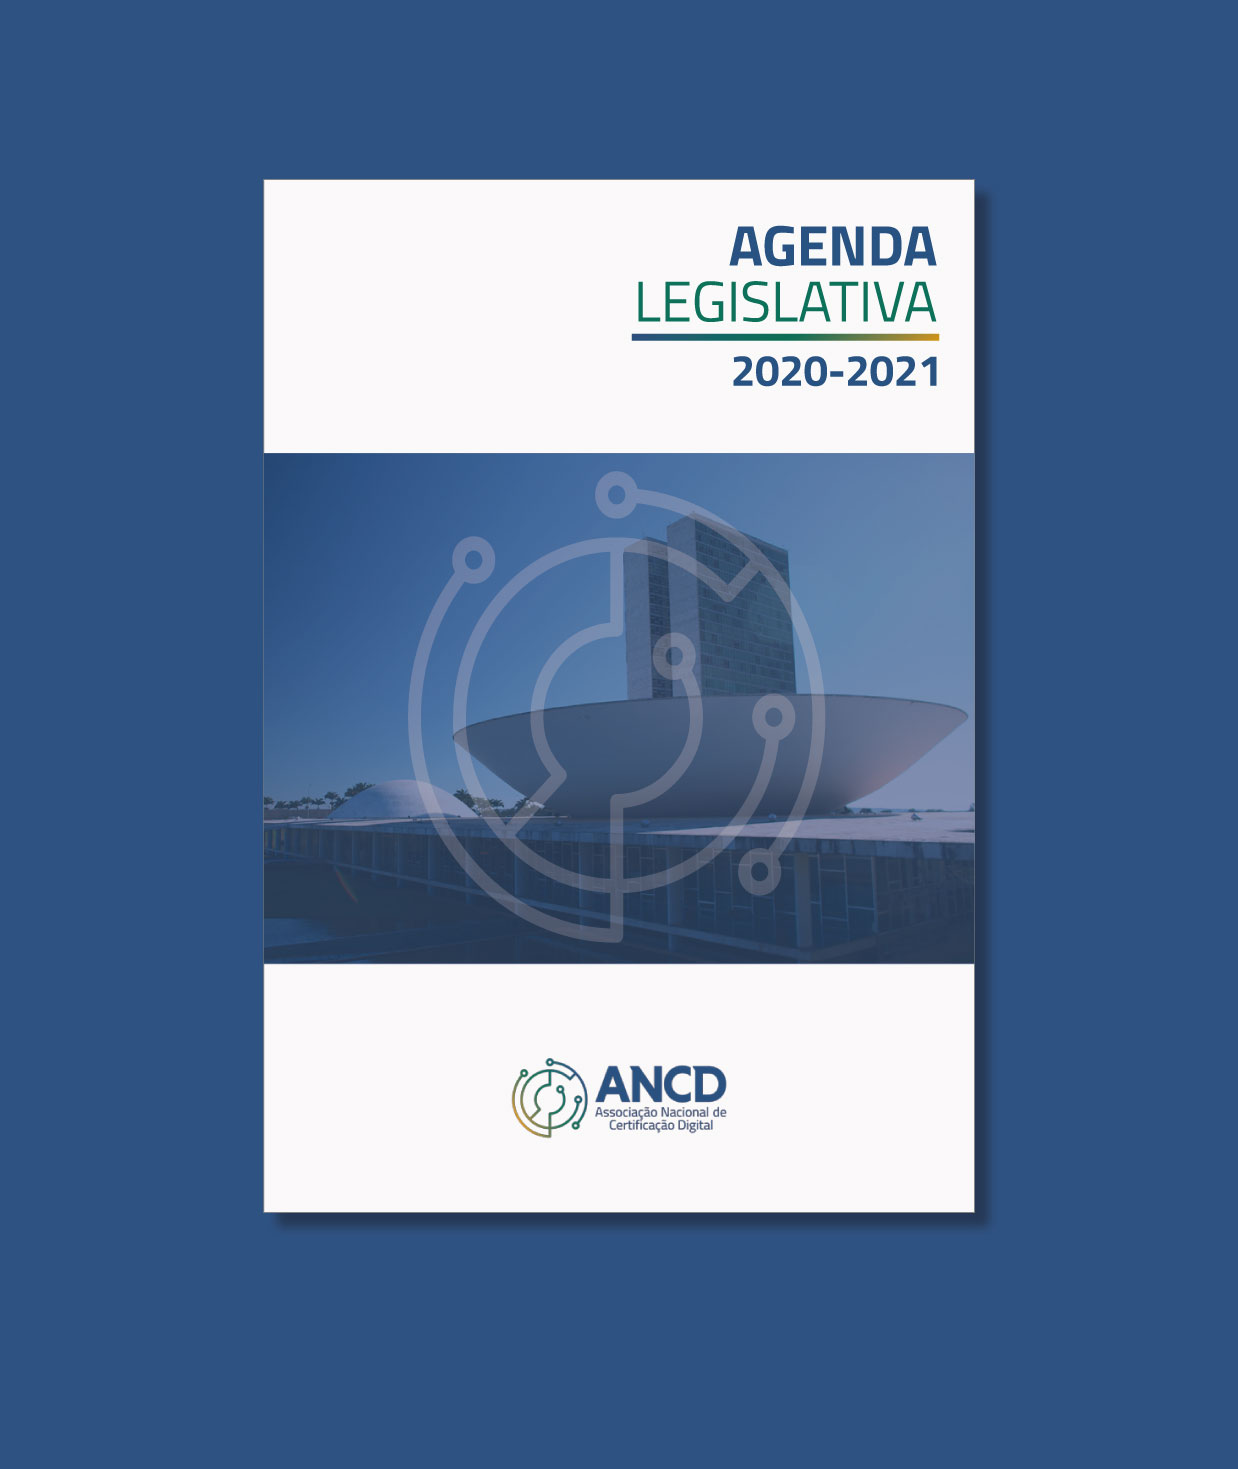 https://ancd.org.br/wp-content/uploads/2020/05/agenda_final.jpg